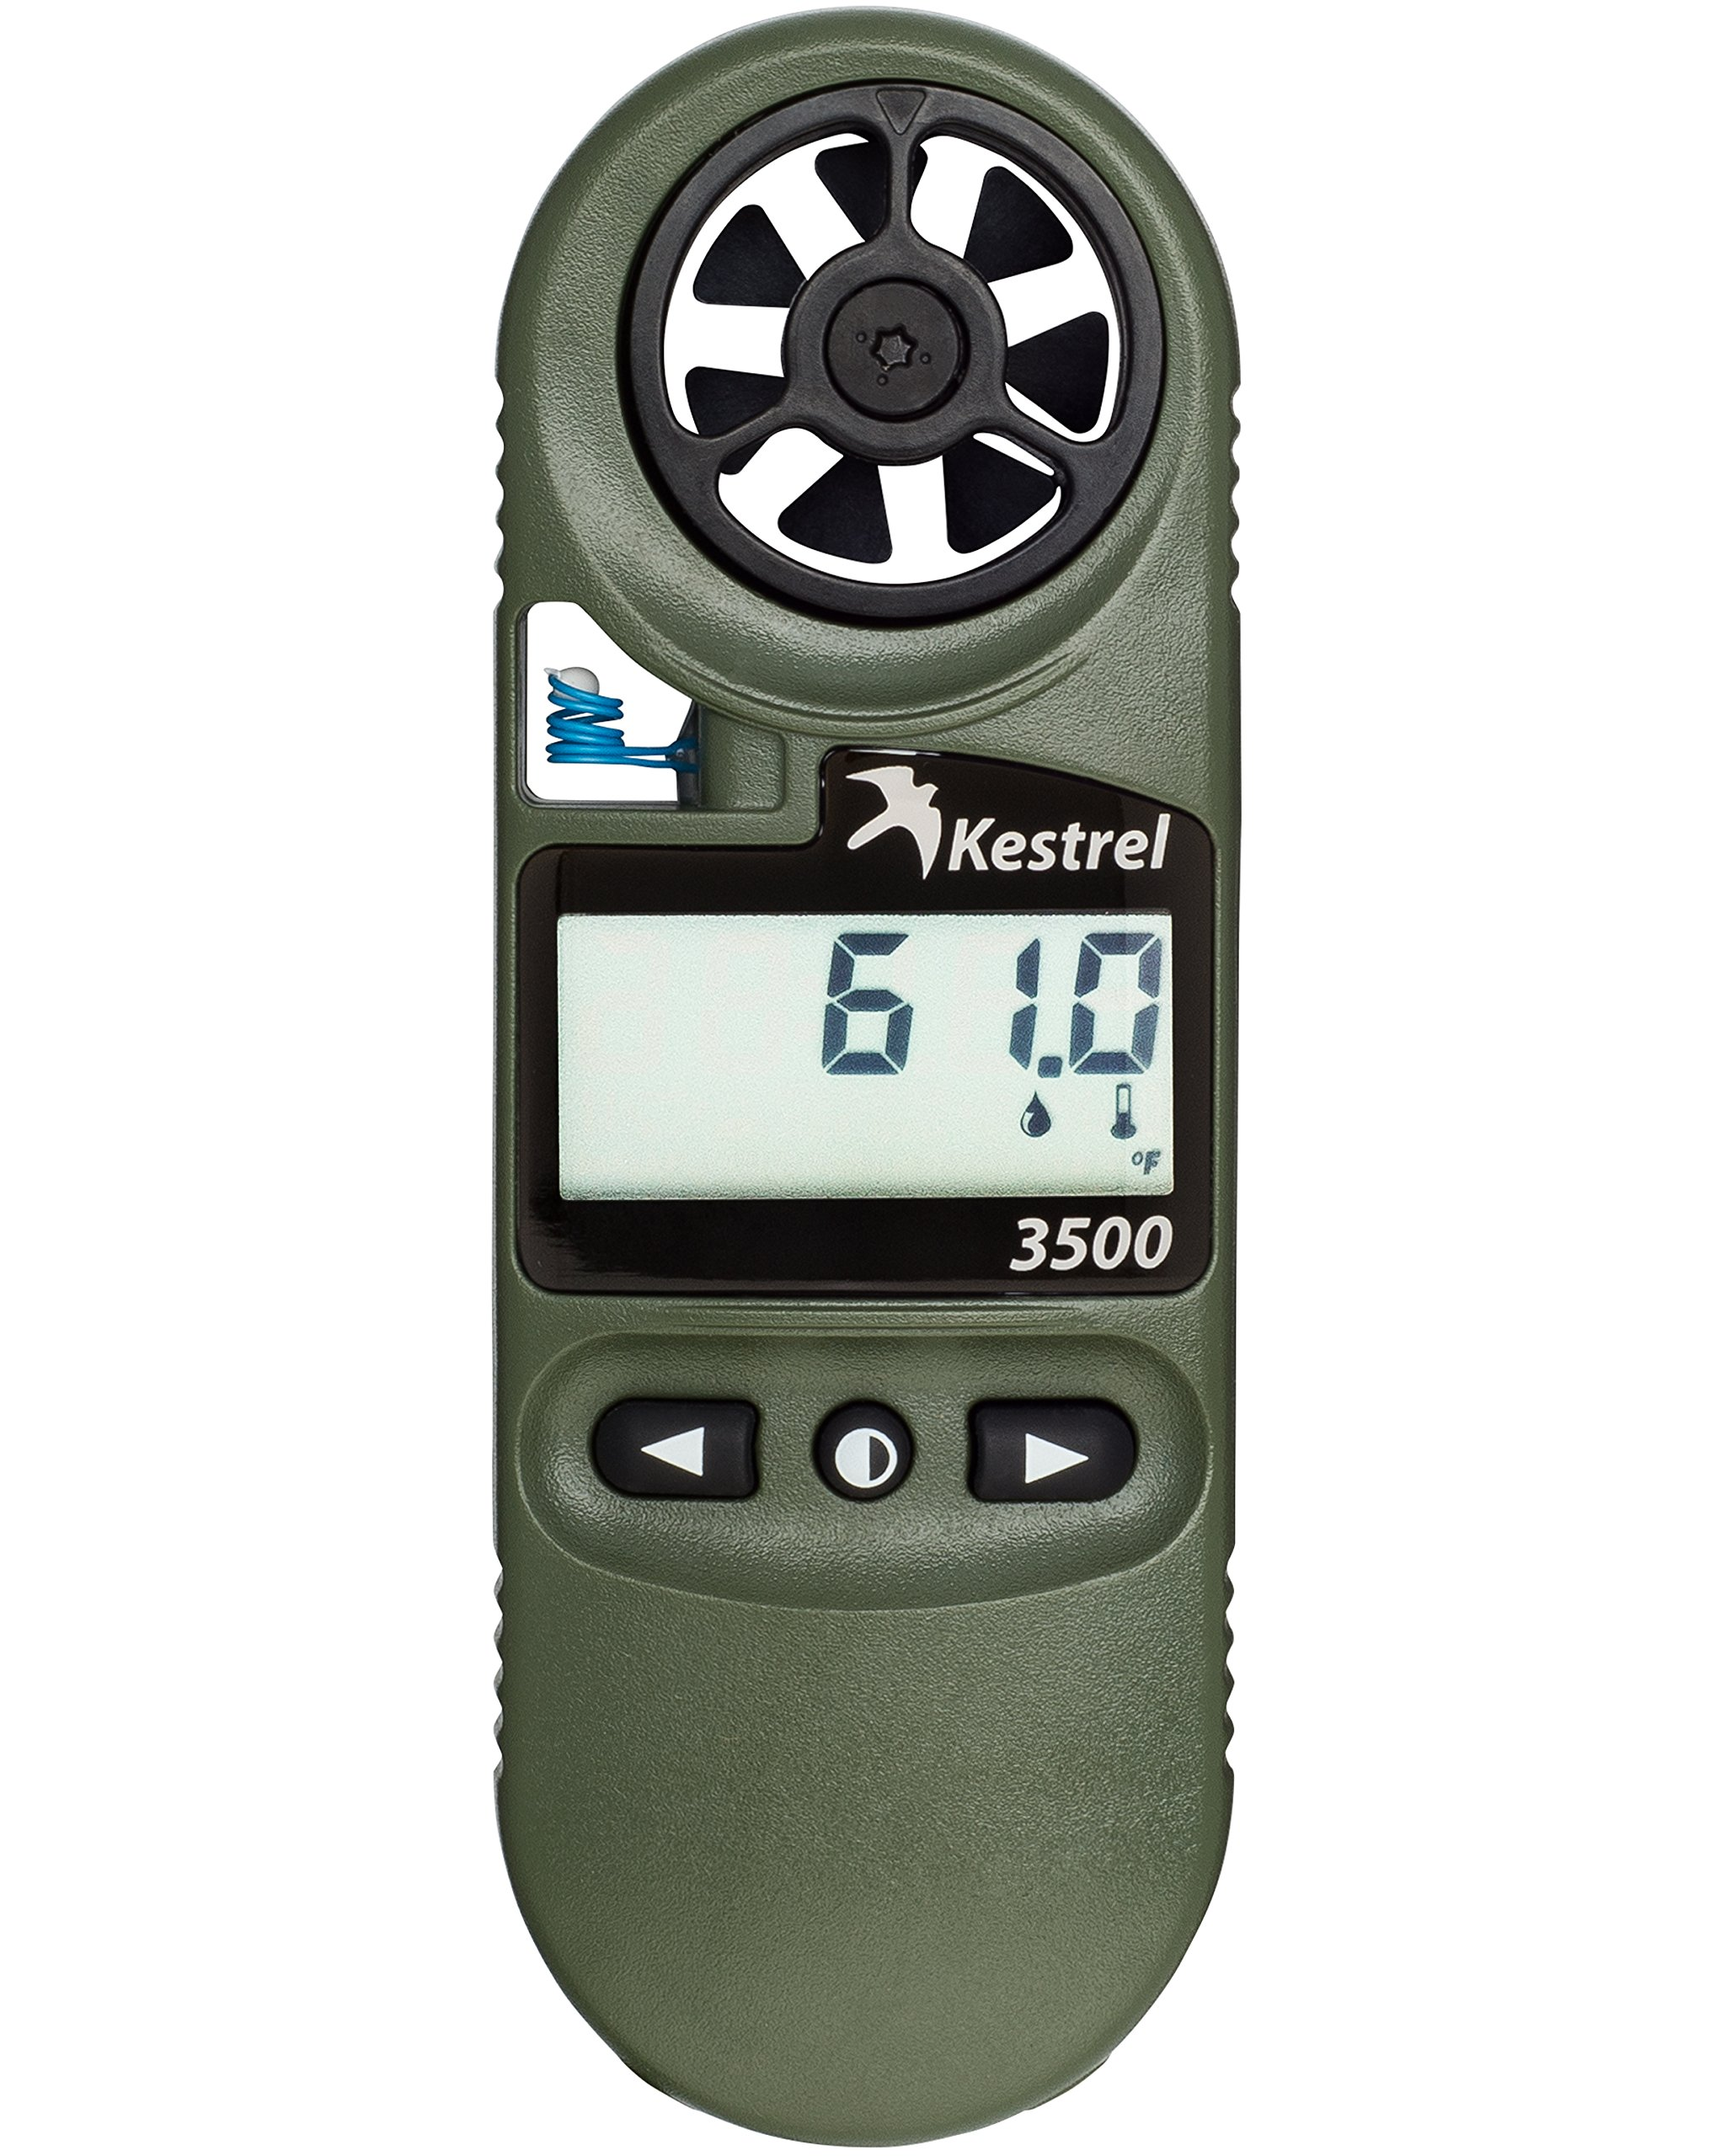 Kestrel 3500 Pocket Weather Meter with Night Vision, Olive Drab by Kestrel